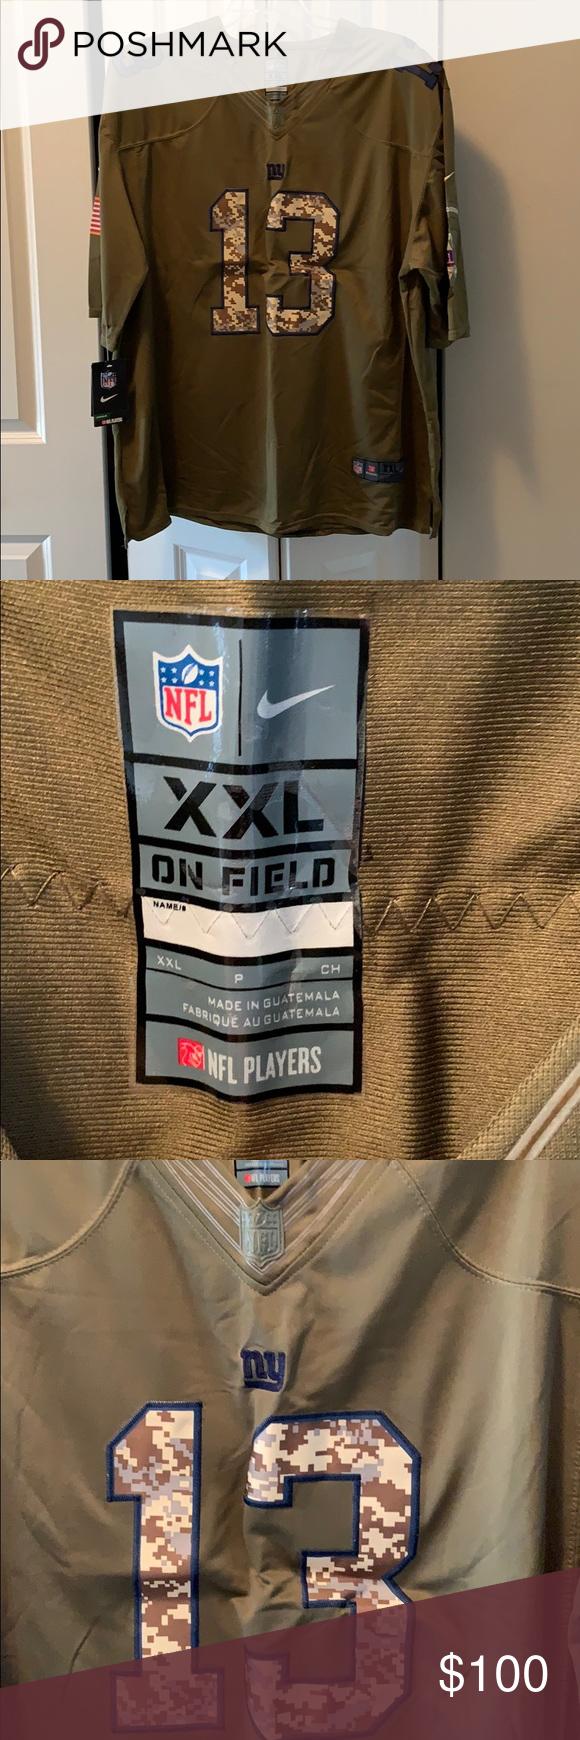 NFL NIKE Beckham Jr Jersey (salute to service) Brand new. RARE. Salute to service. Nike Shirts #salutetoservice NFL NIKE Beckham Jr Jersey (salute to service) Brand new. RARE. Salute to service. Nike Shirts #salutetoservice